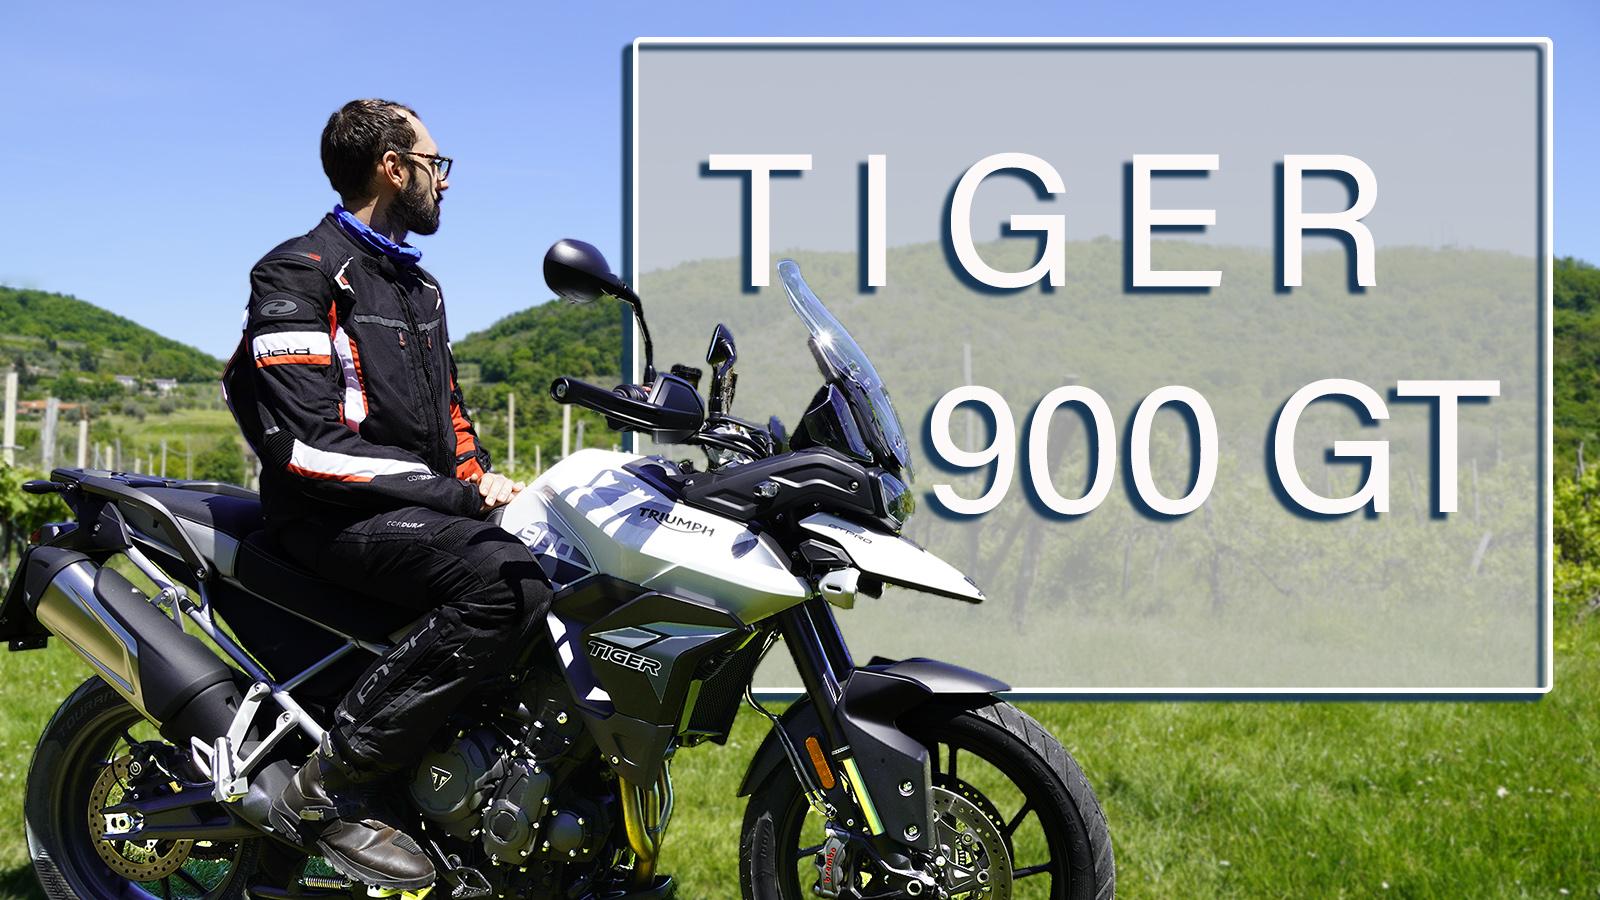 triumph tiger 900 GT PRO